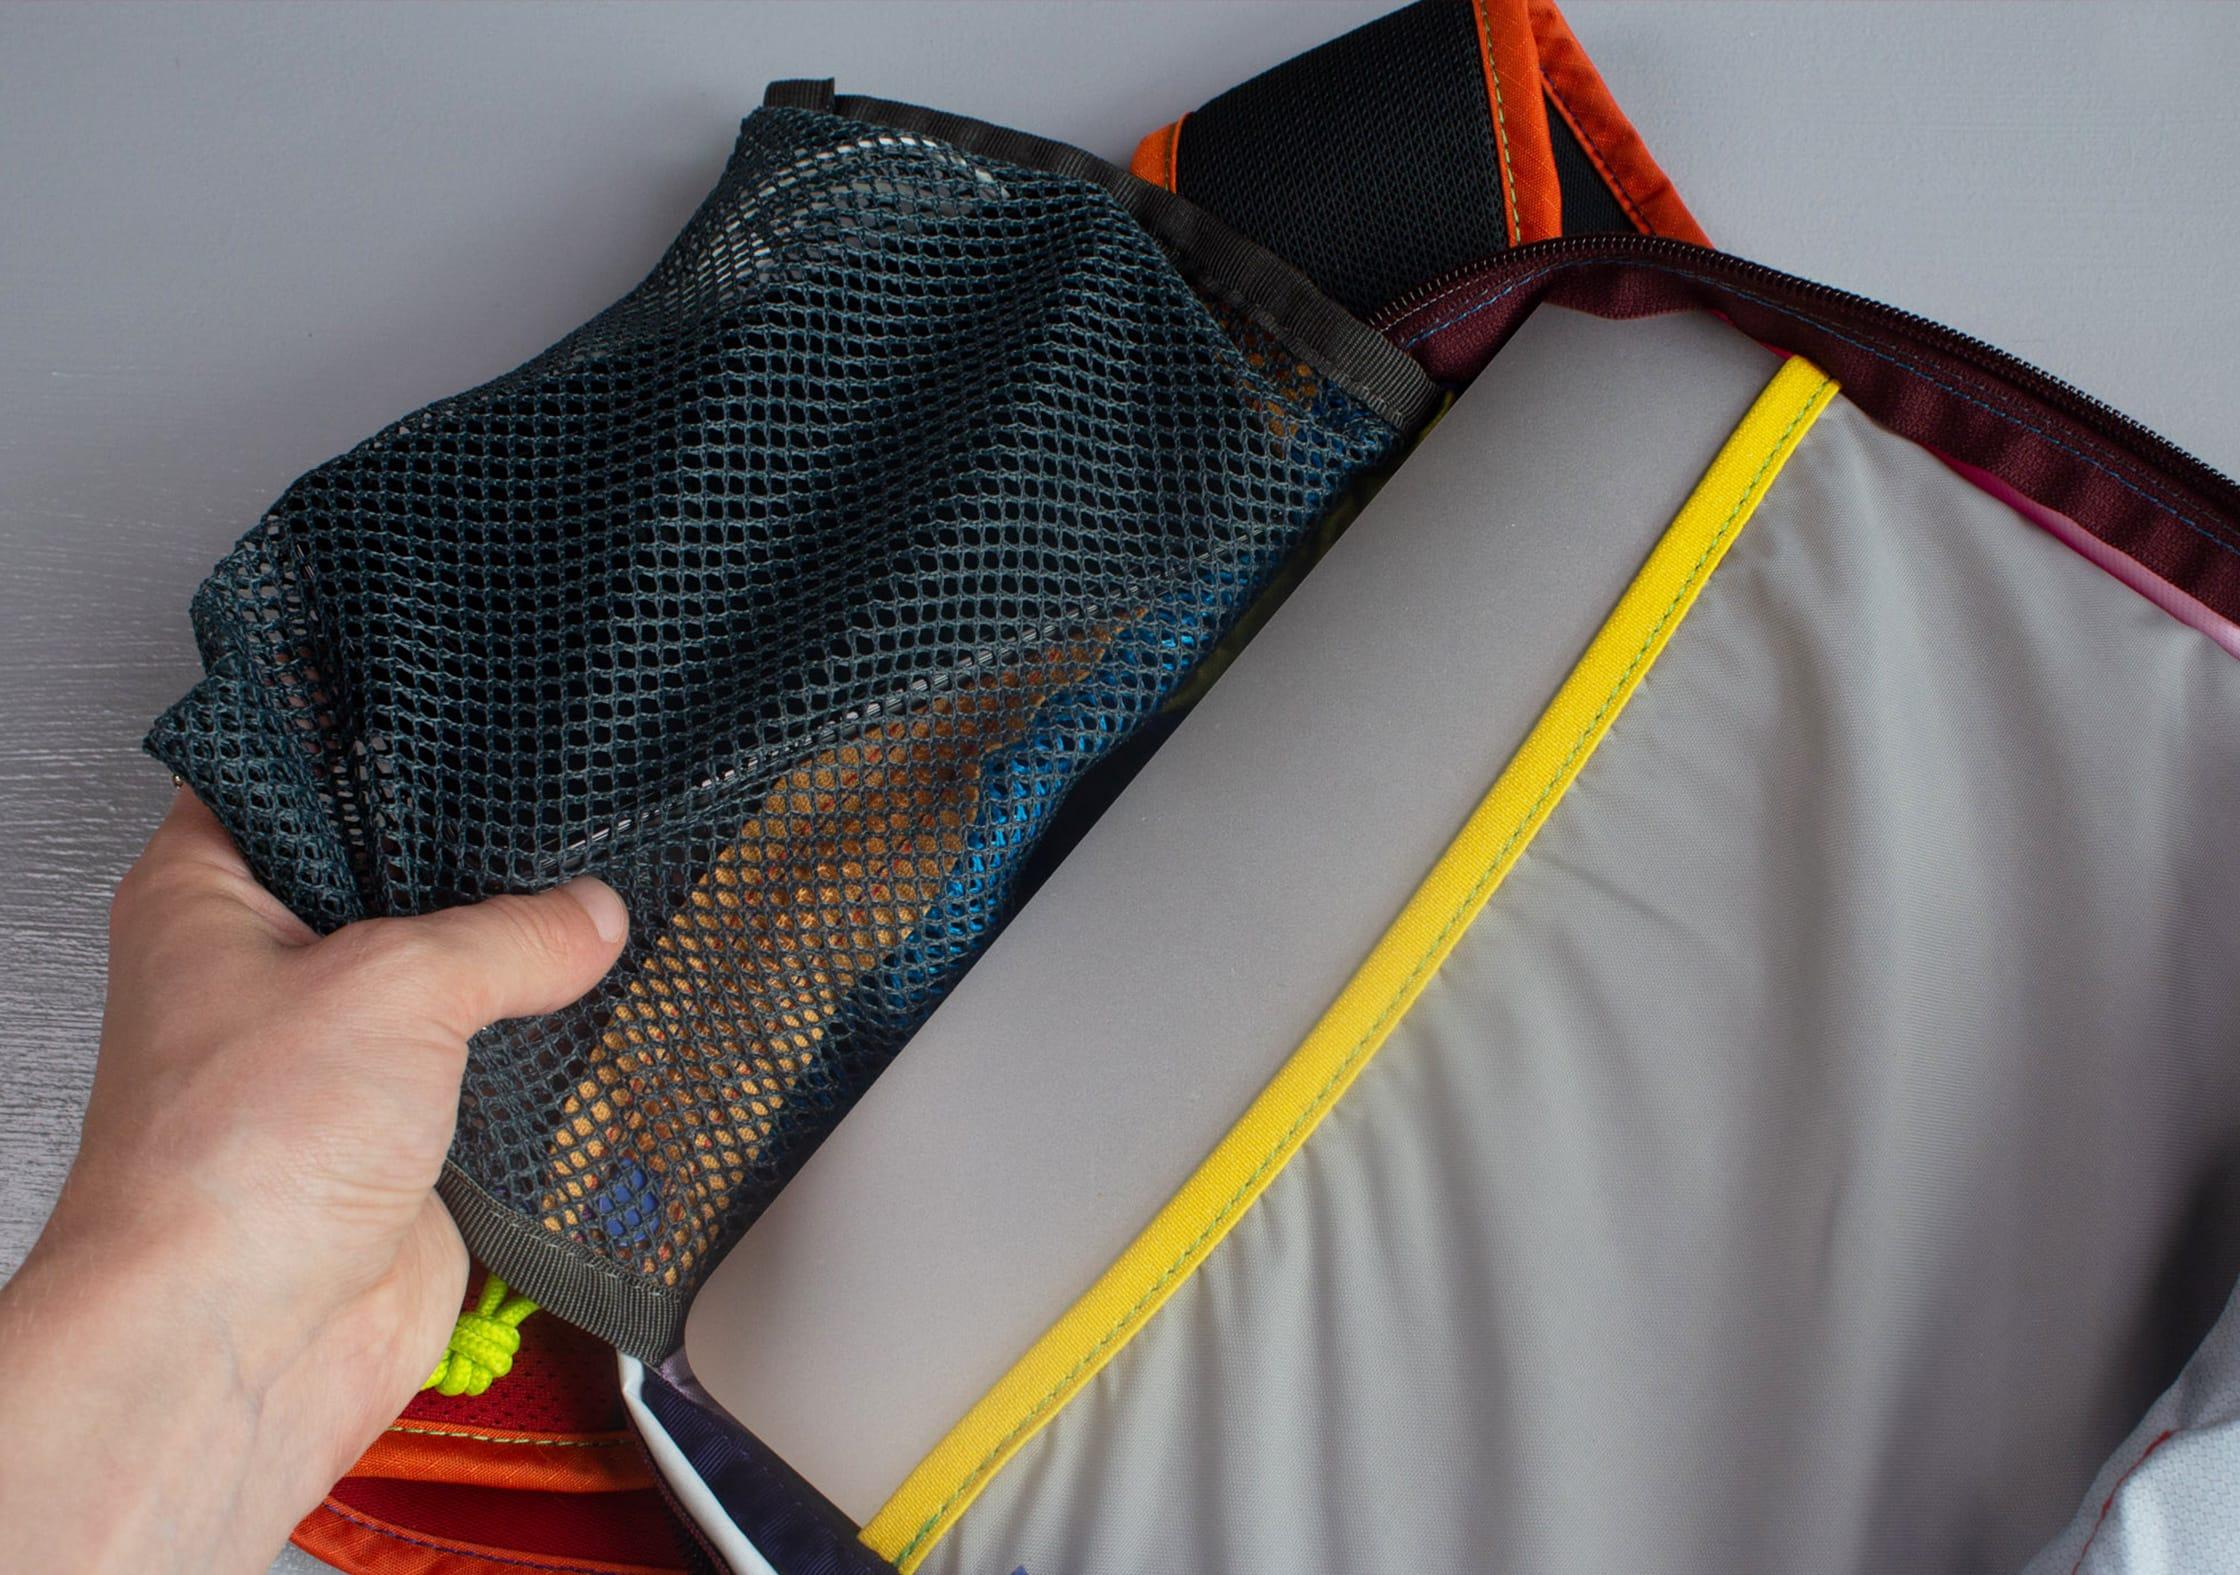 Cotopaxi Batac Water Bladder Holder / Daring Laptop Compartment